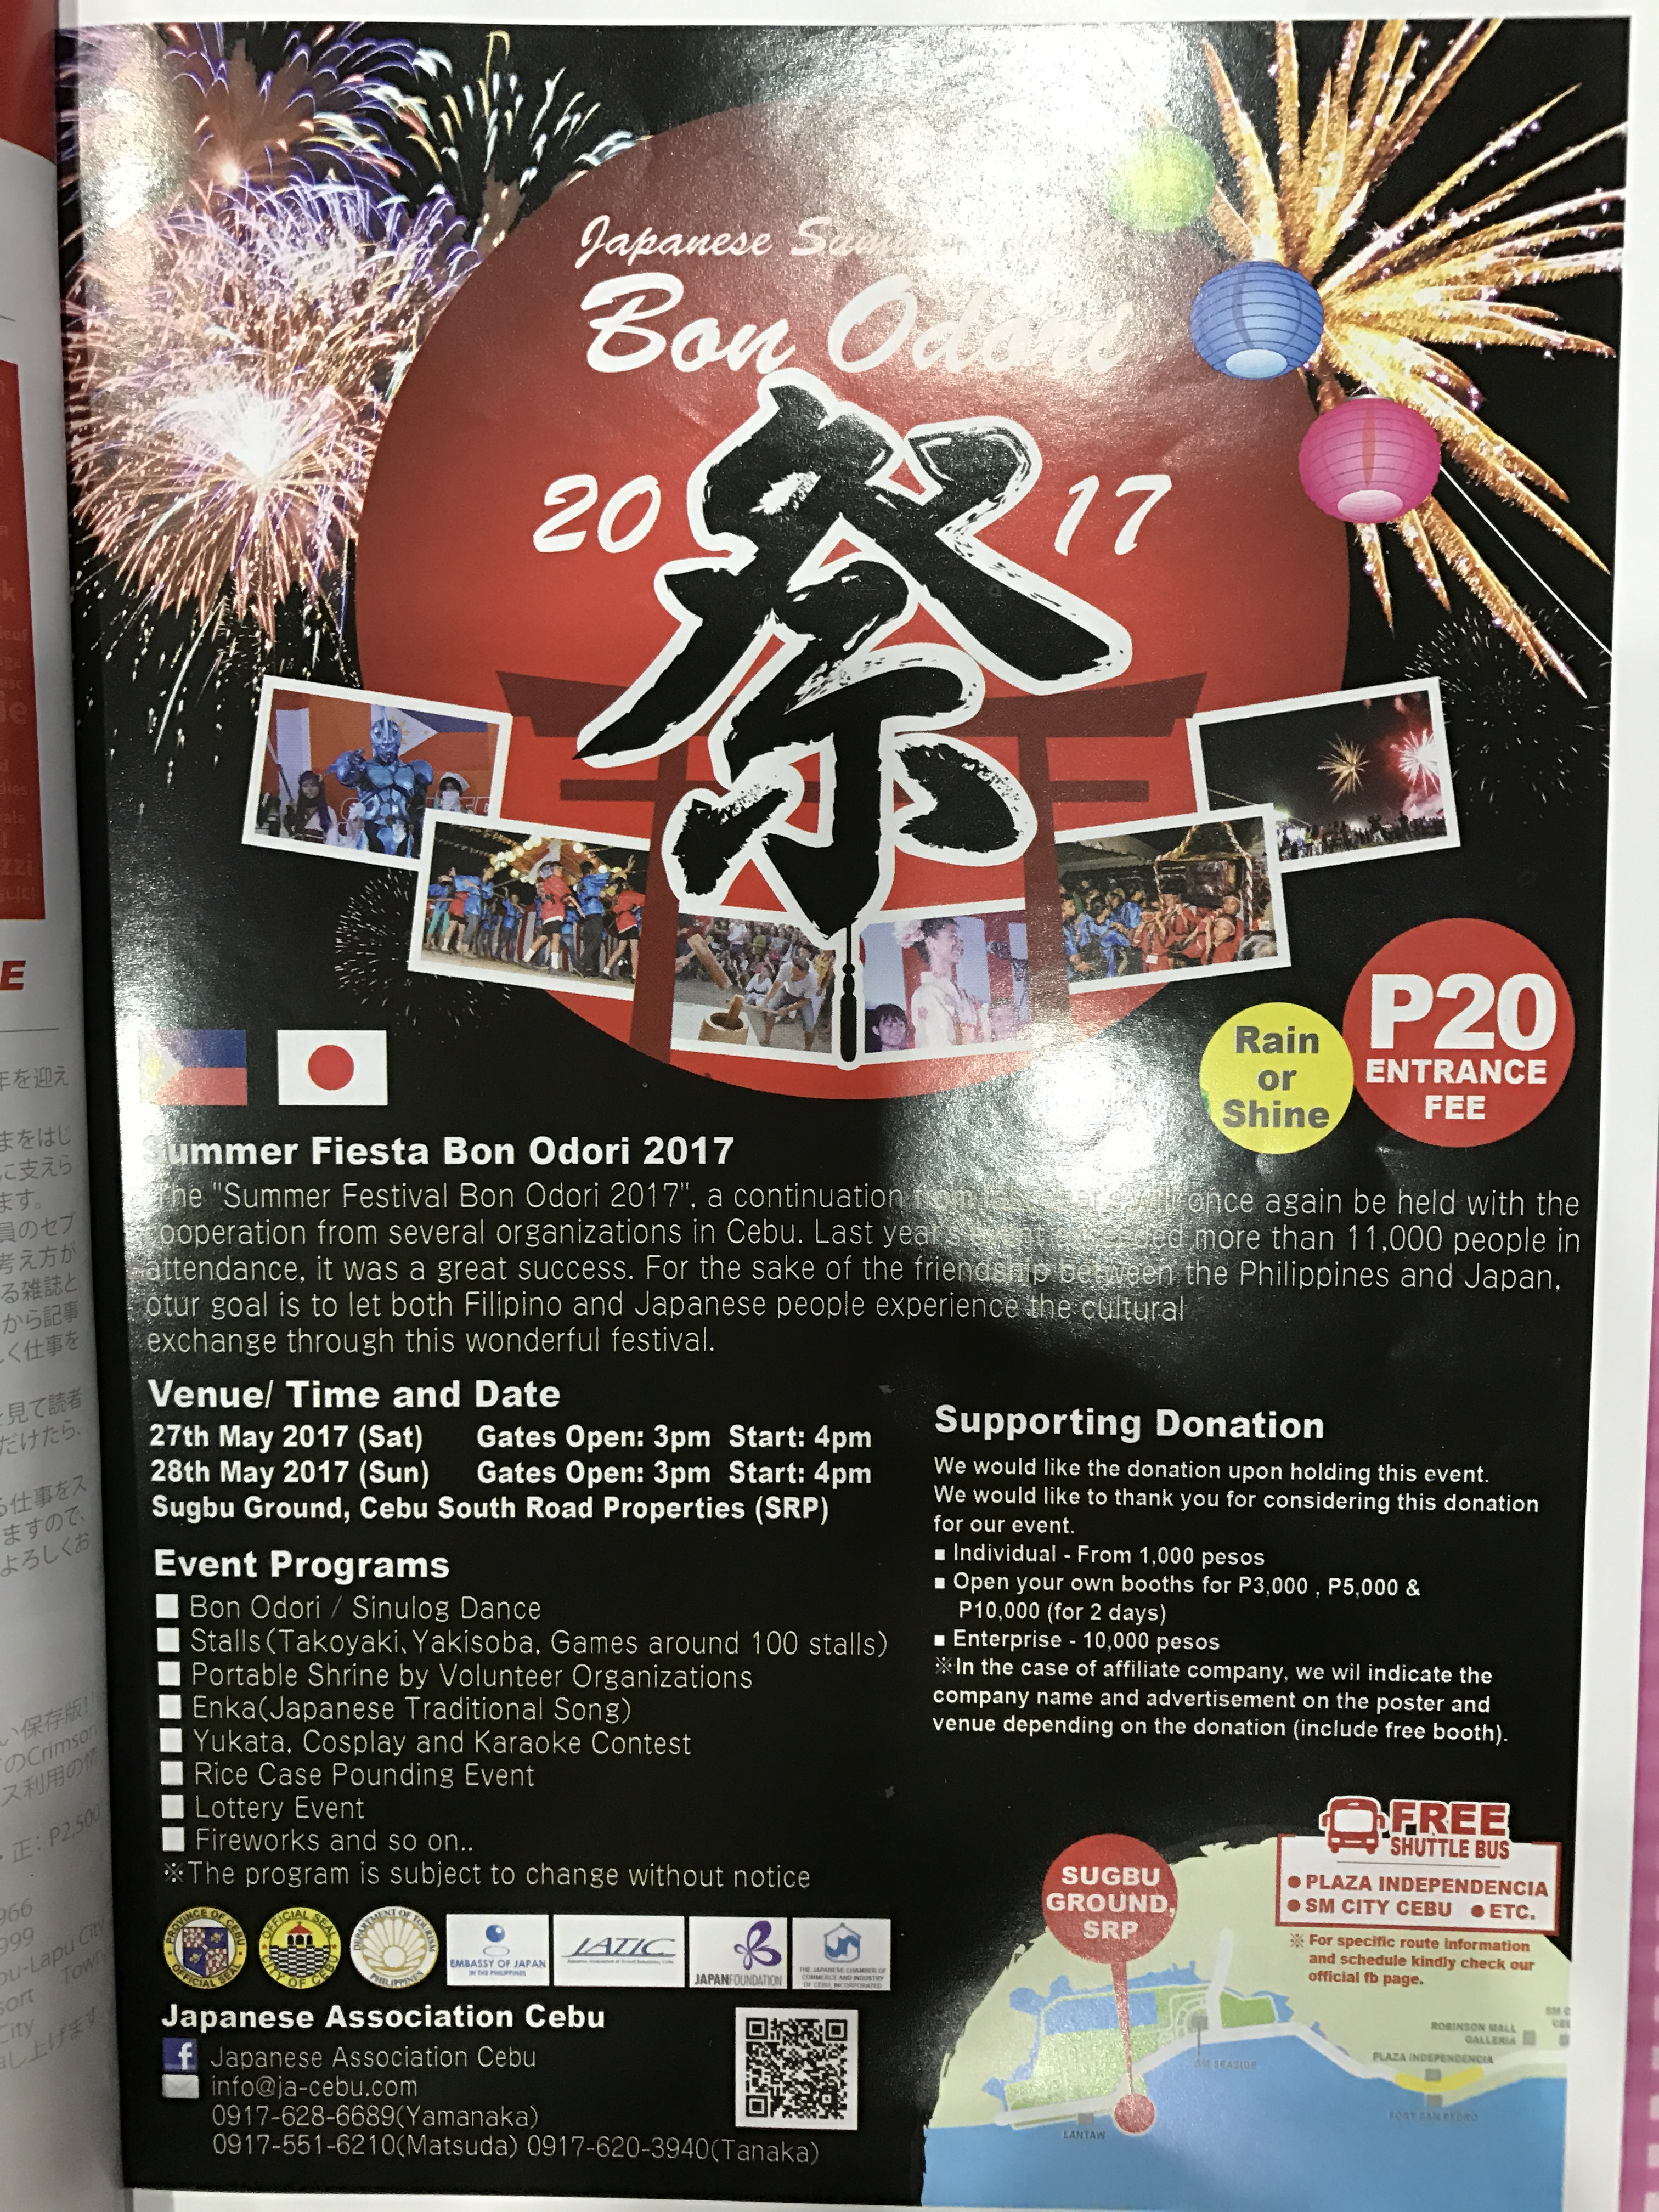 盆踊り(Summer Fiesta Bon Odori 2017)